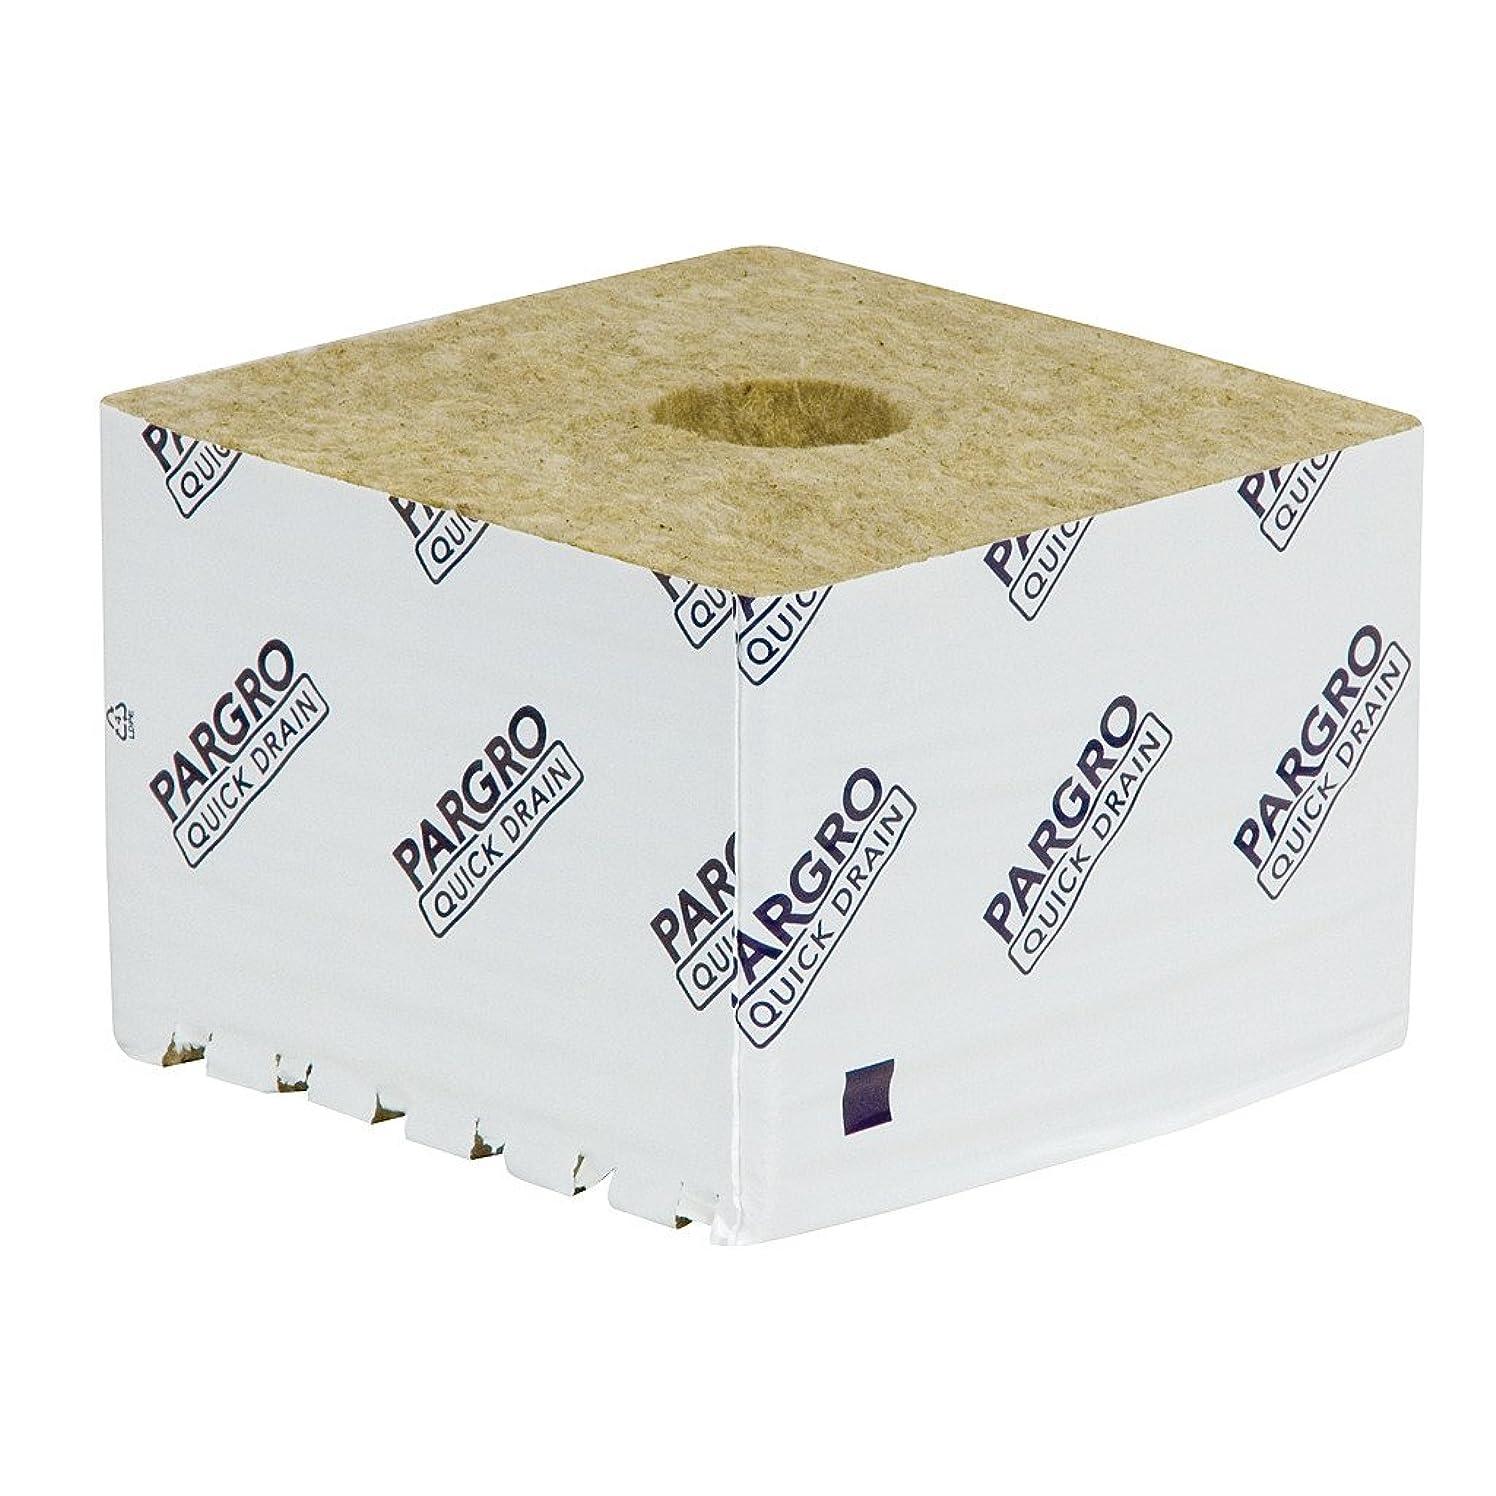 Grodan Pargro QD Jumbo Block 6 in x 6 in x 4 in w/Hole